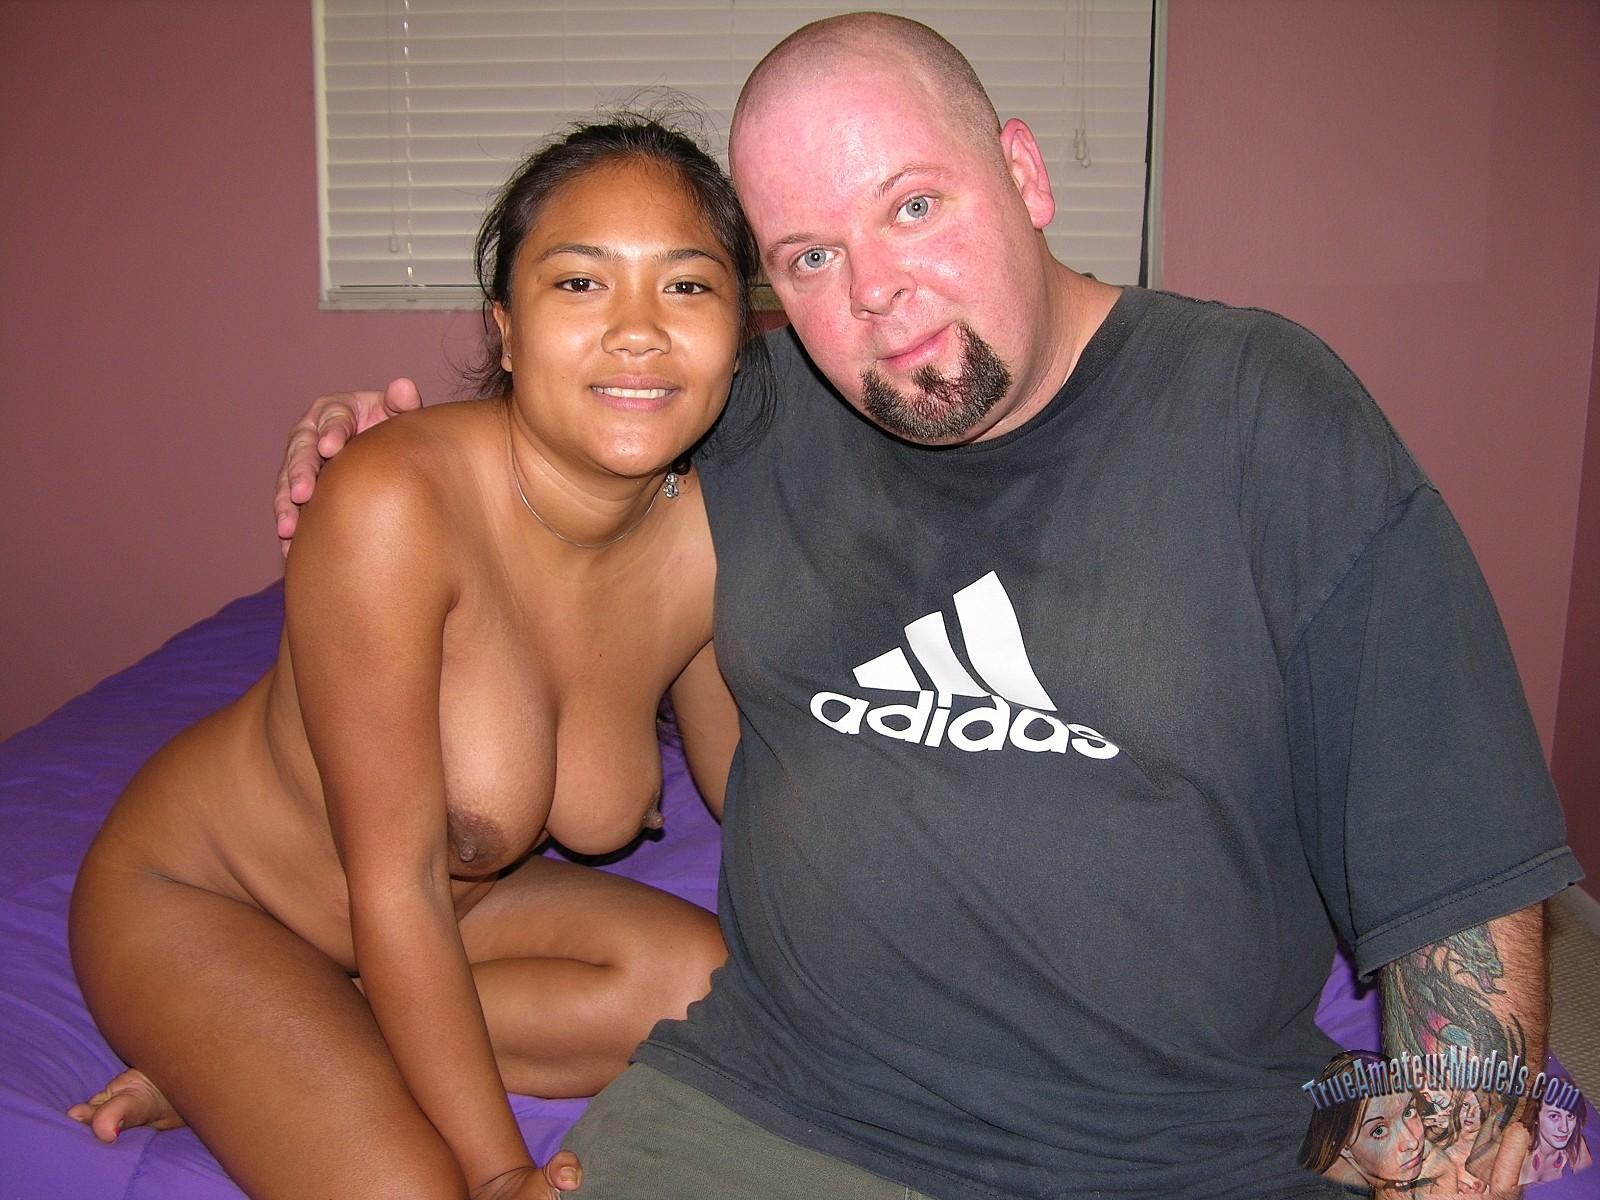 thaimassage västerort free amatör sex